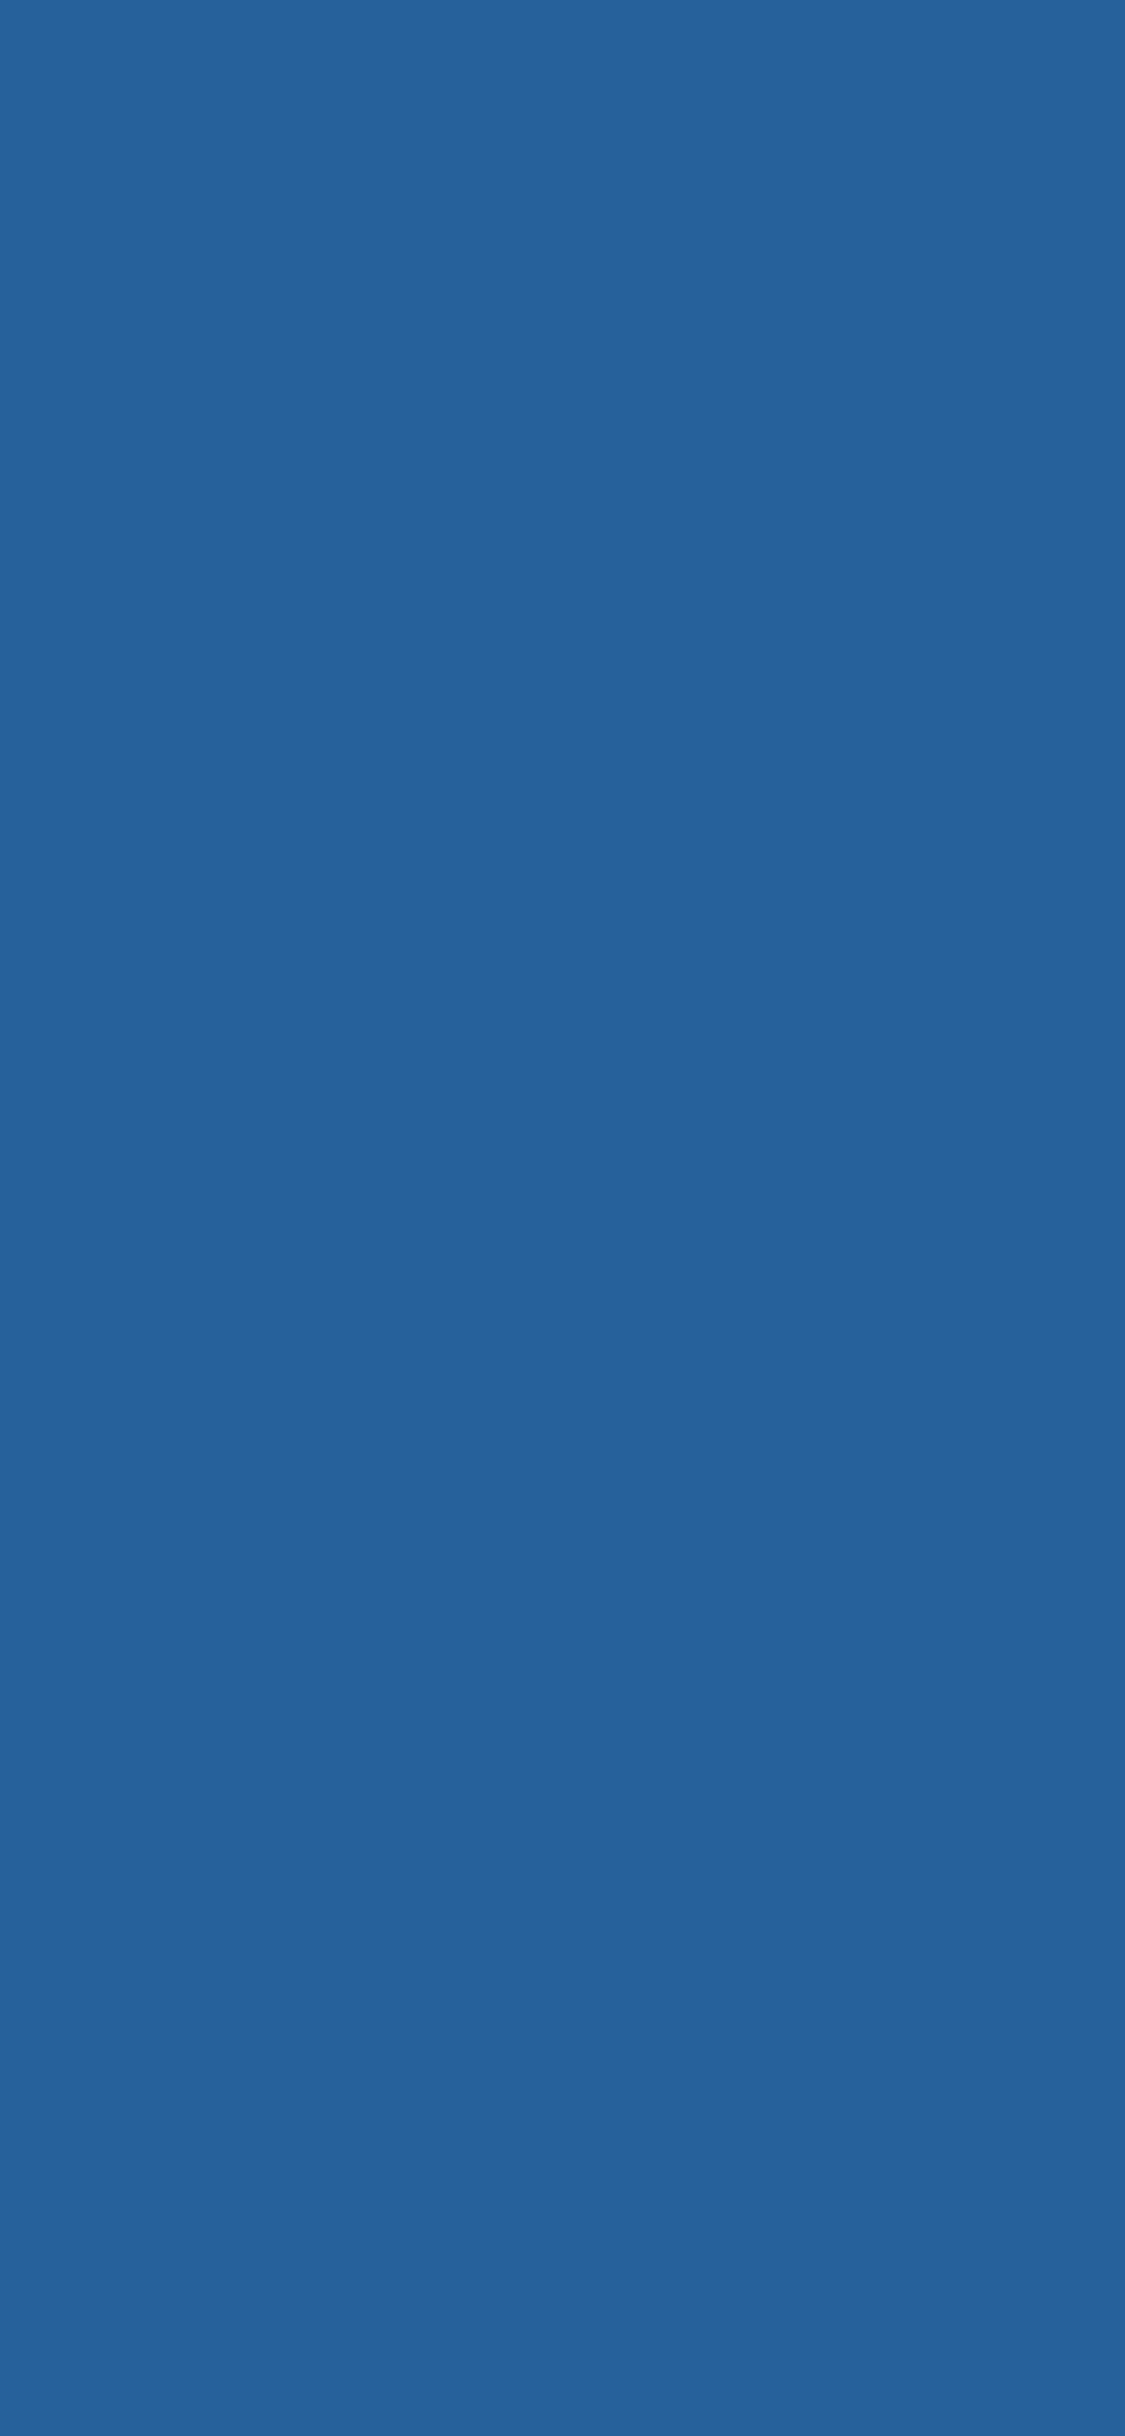 1125x2436 Lapis Lazuli Solid Color Background